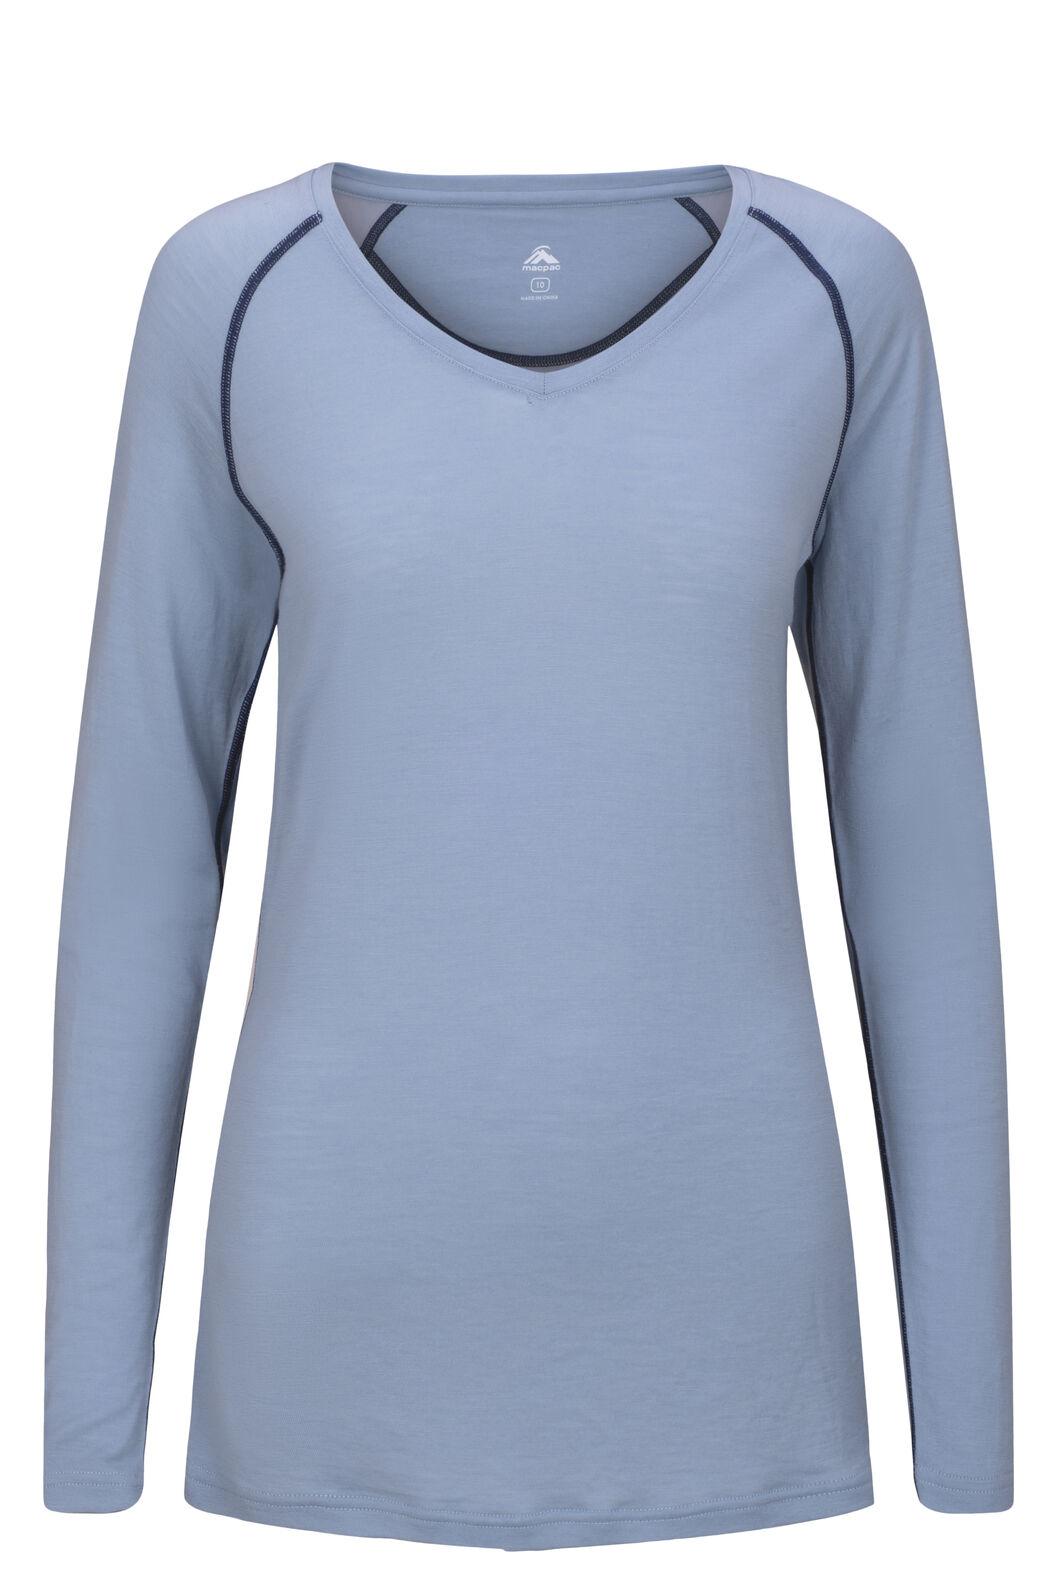 Macpac Women's 150 Merino V-Neck Top, Dusty Blue, hi-res